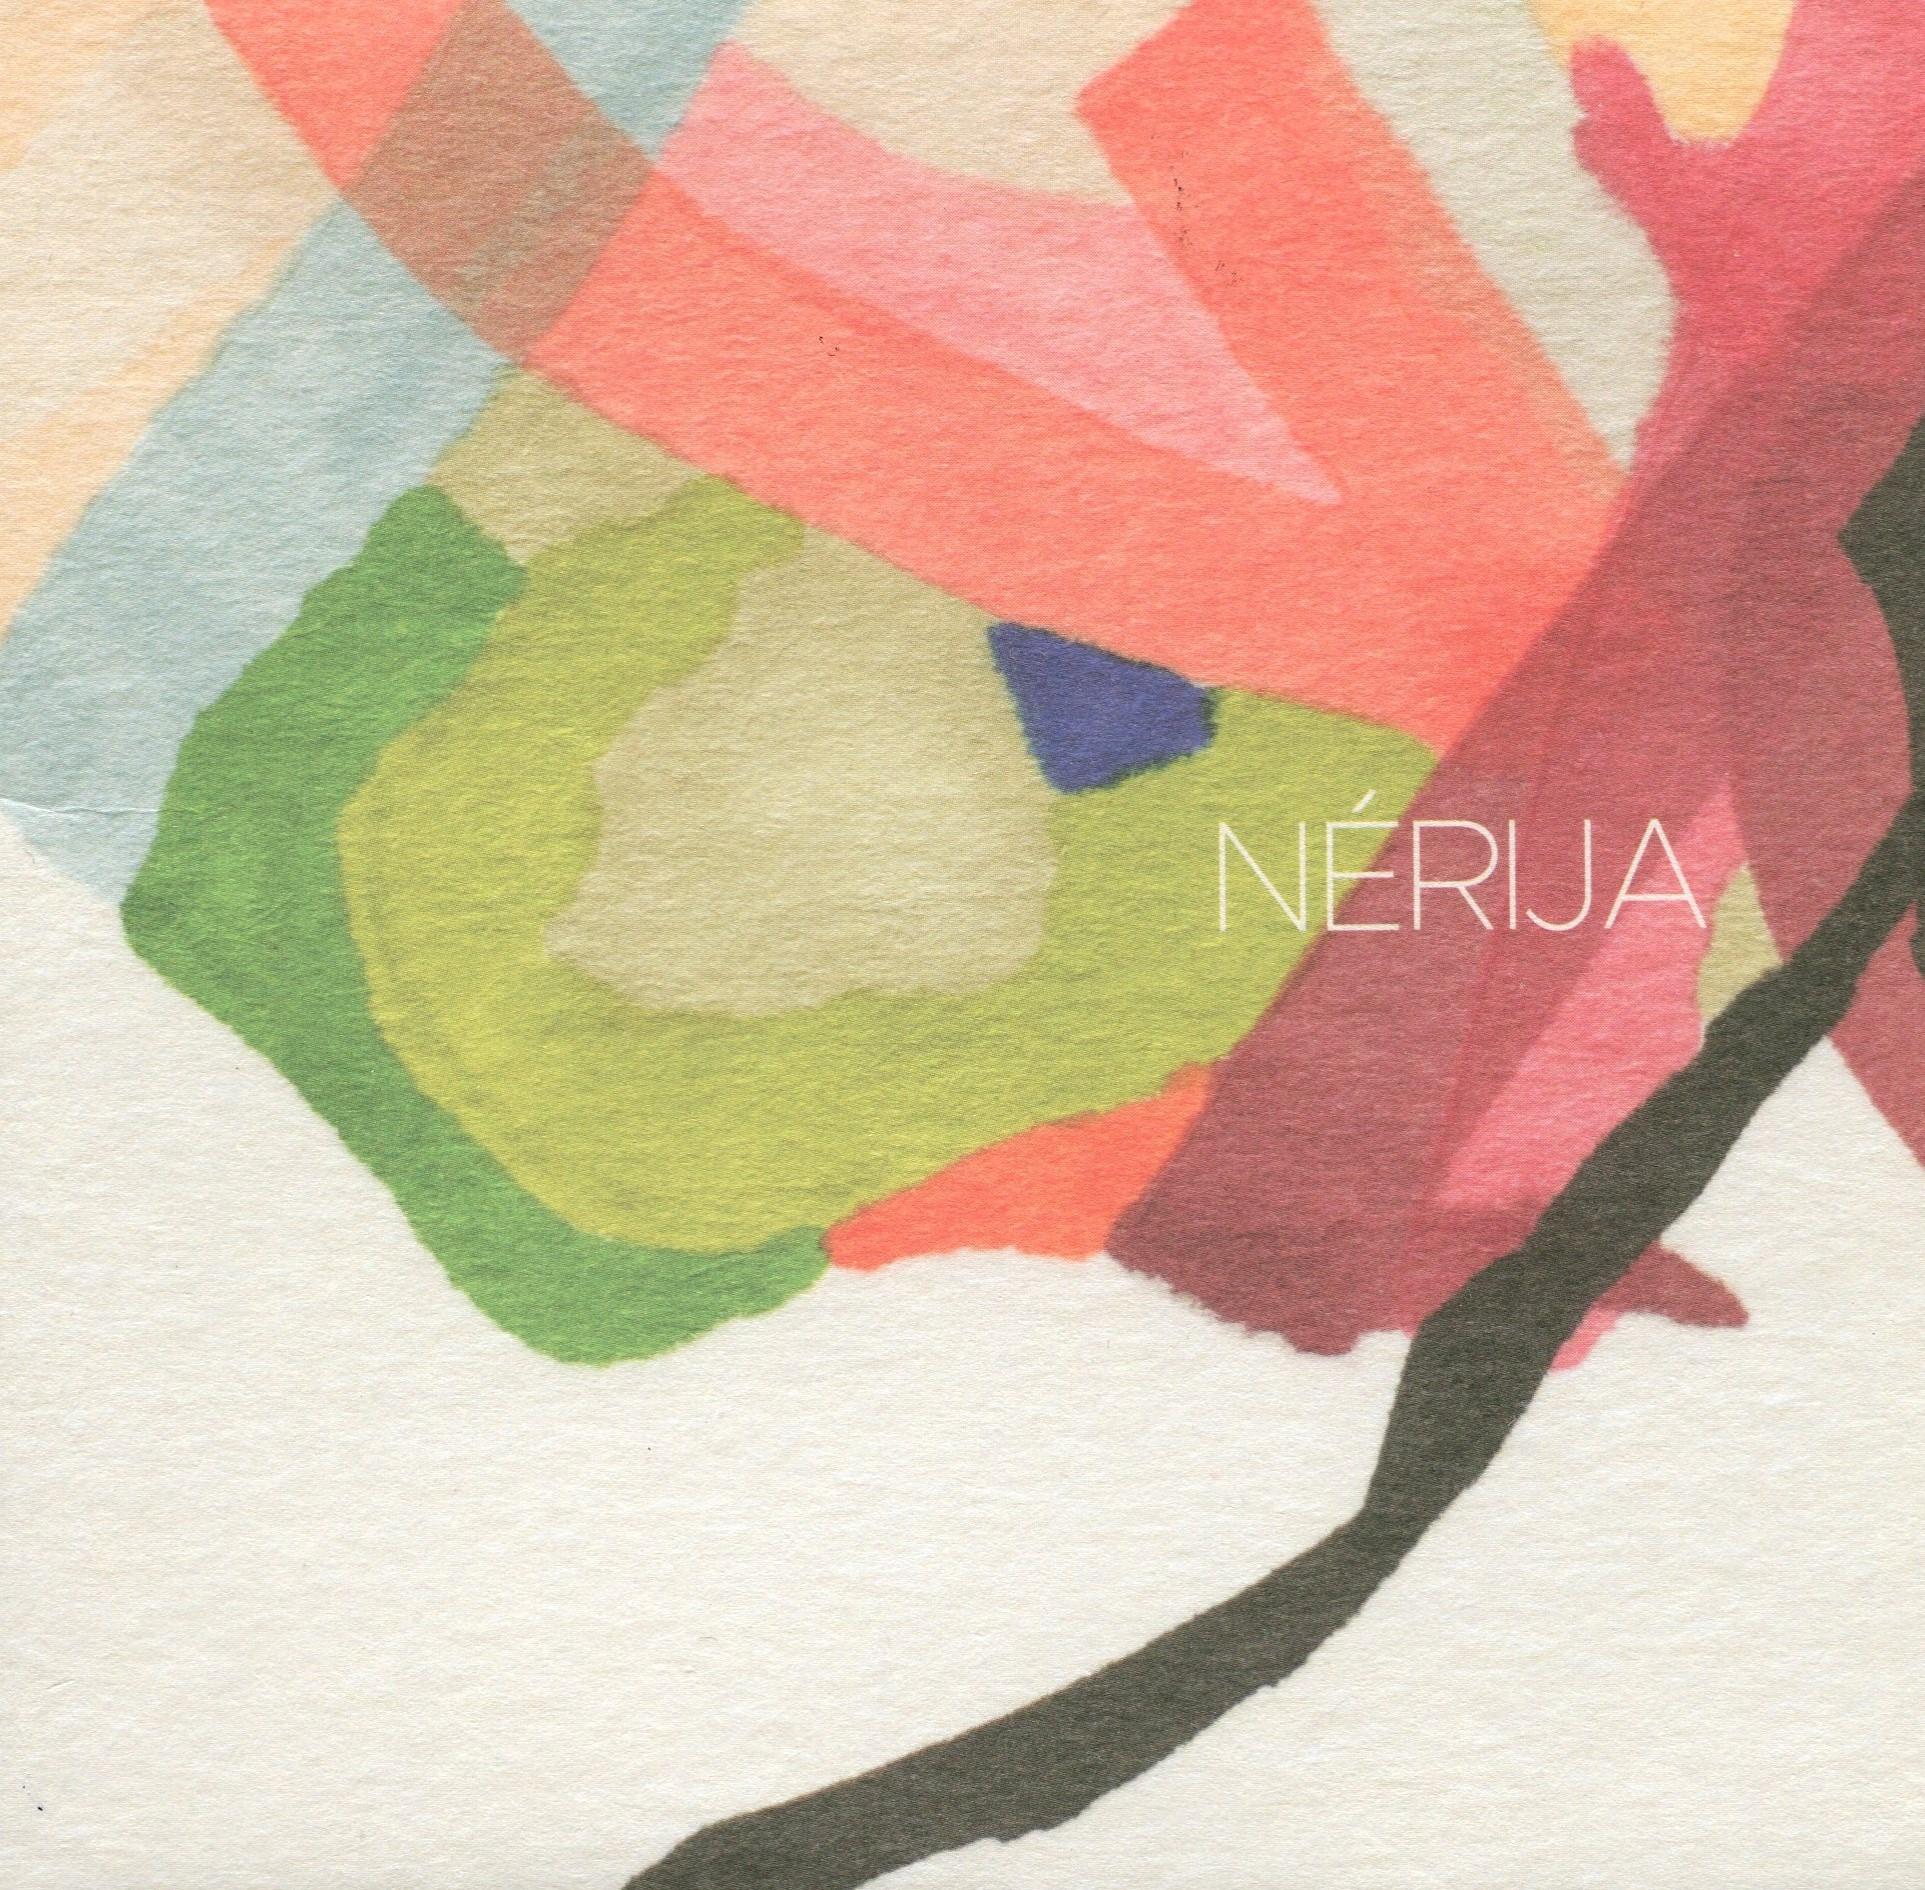 NerijaAlbumCover.jpg